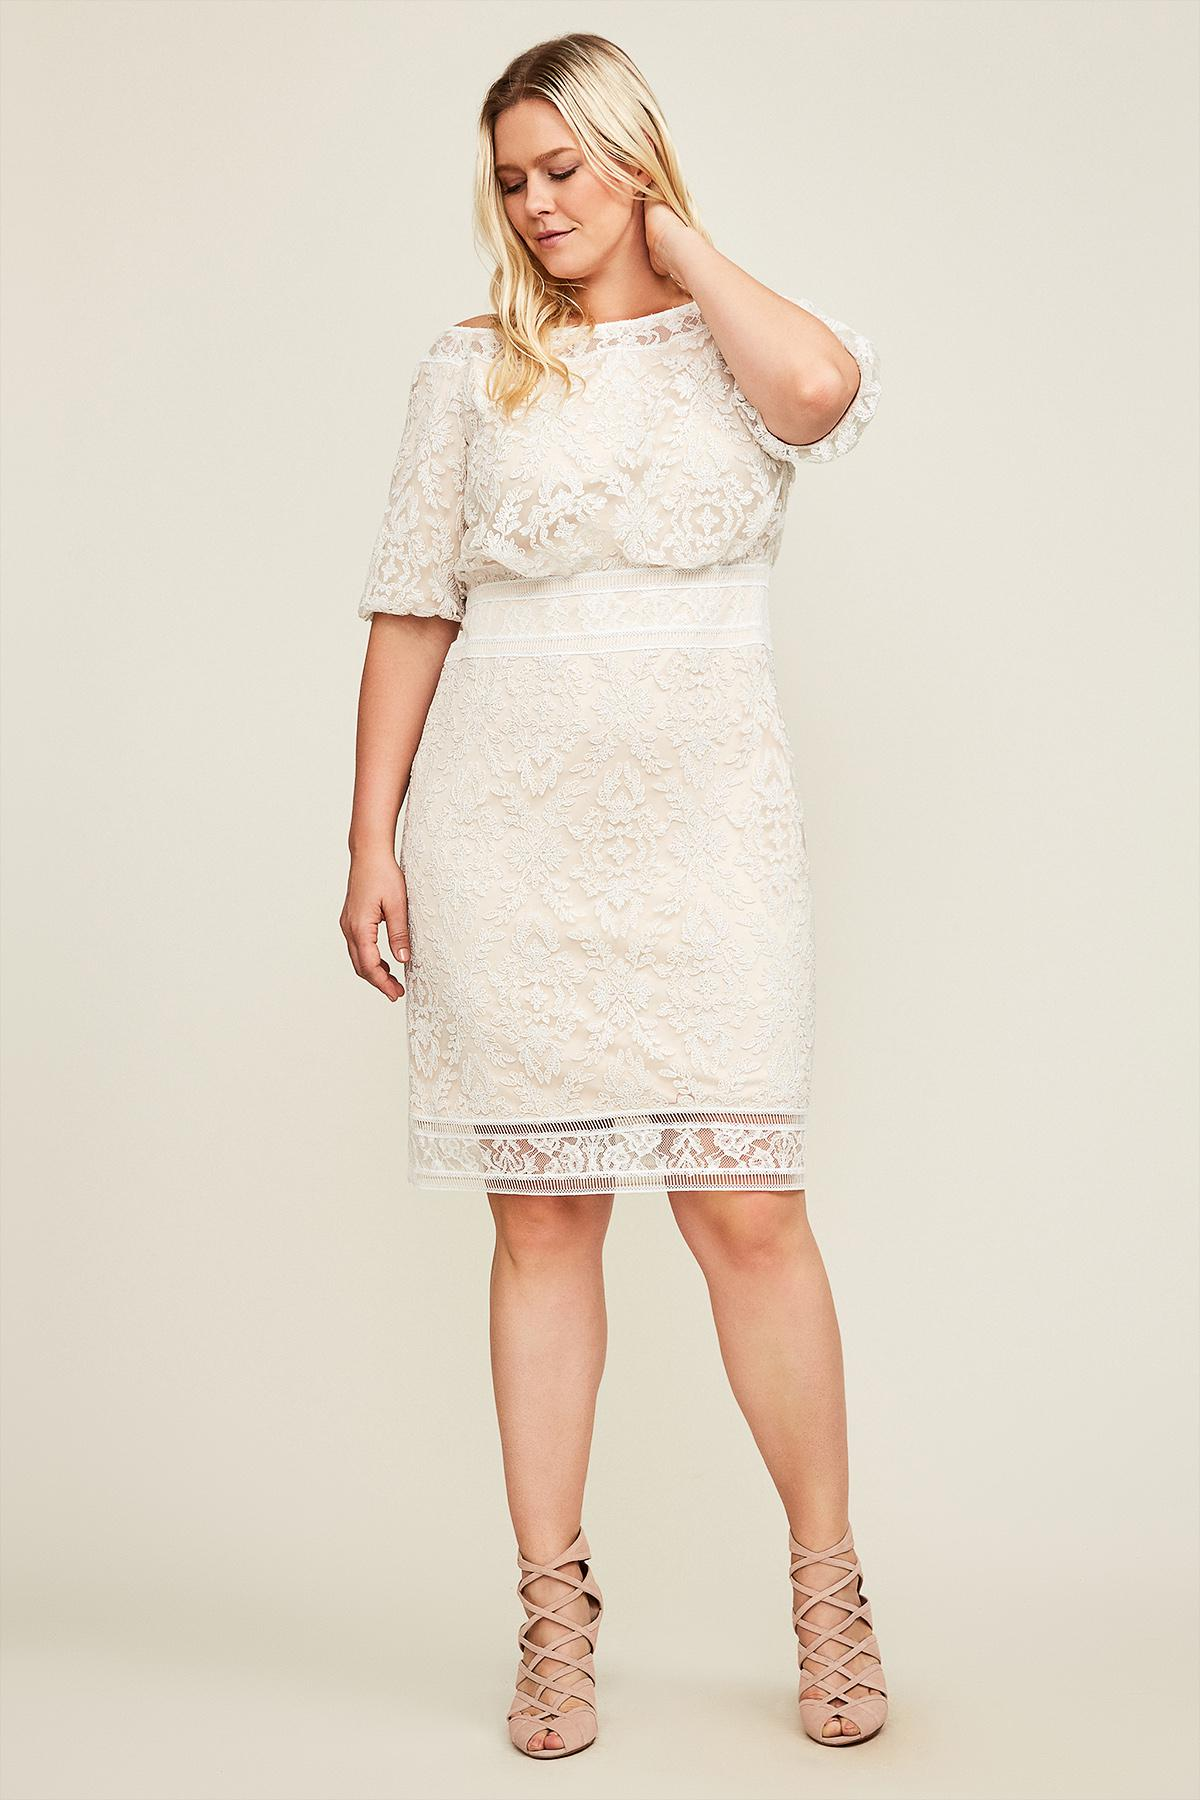 802251287be Tadashi Shoji Bianca Dress - Plus Size in Natural - Lyst